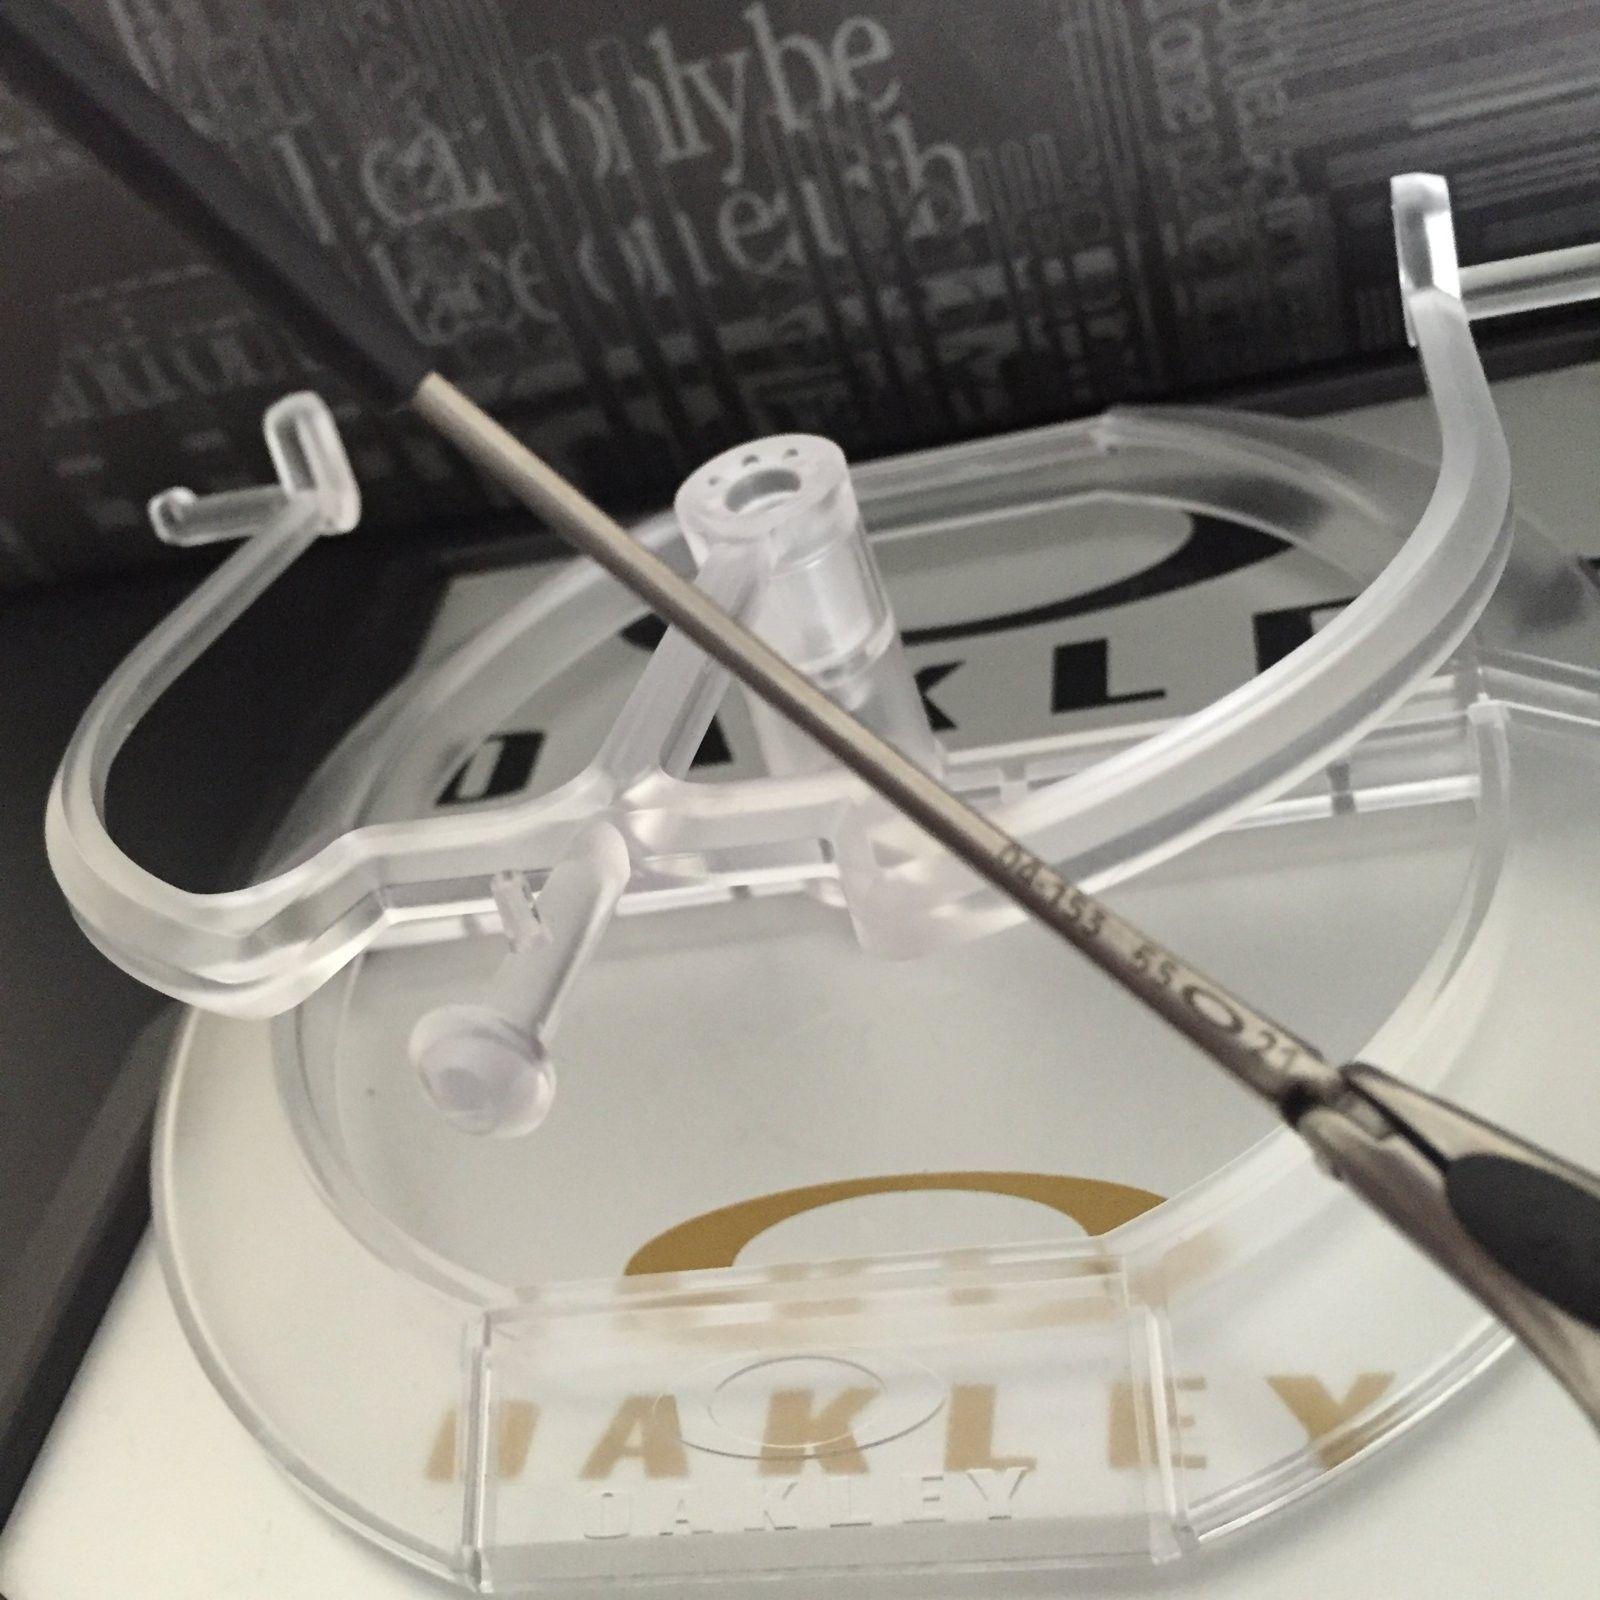 oakley juliet plasma good price - IMG_4927.JPG